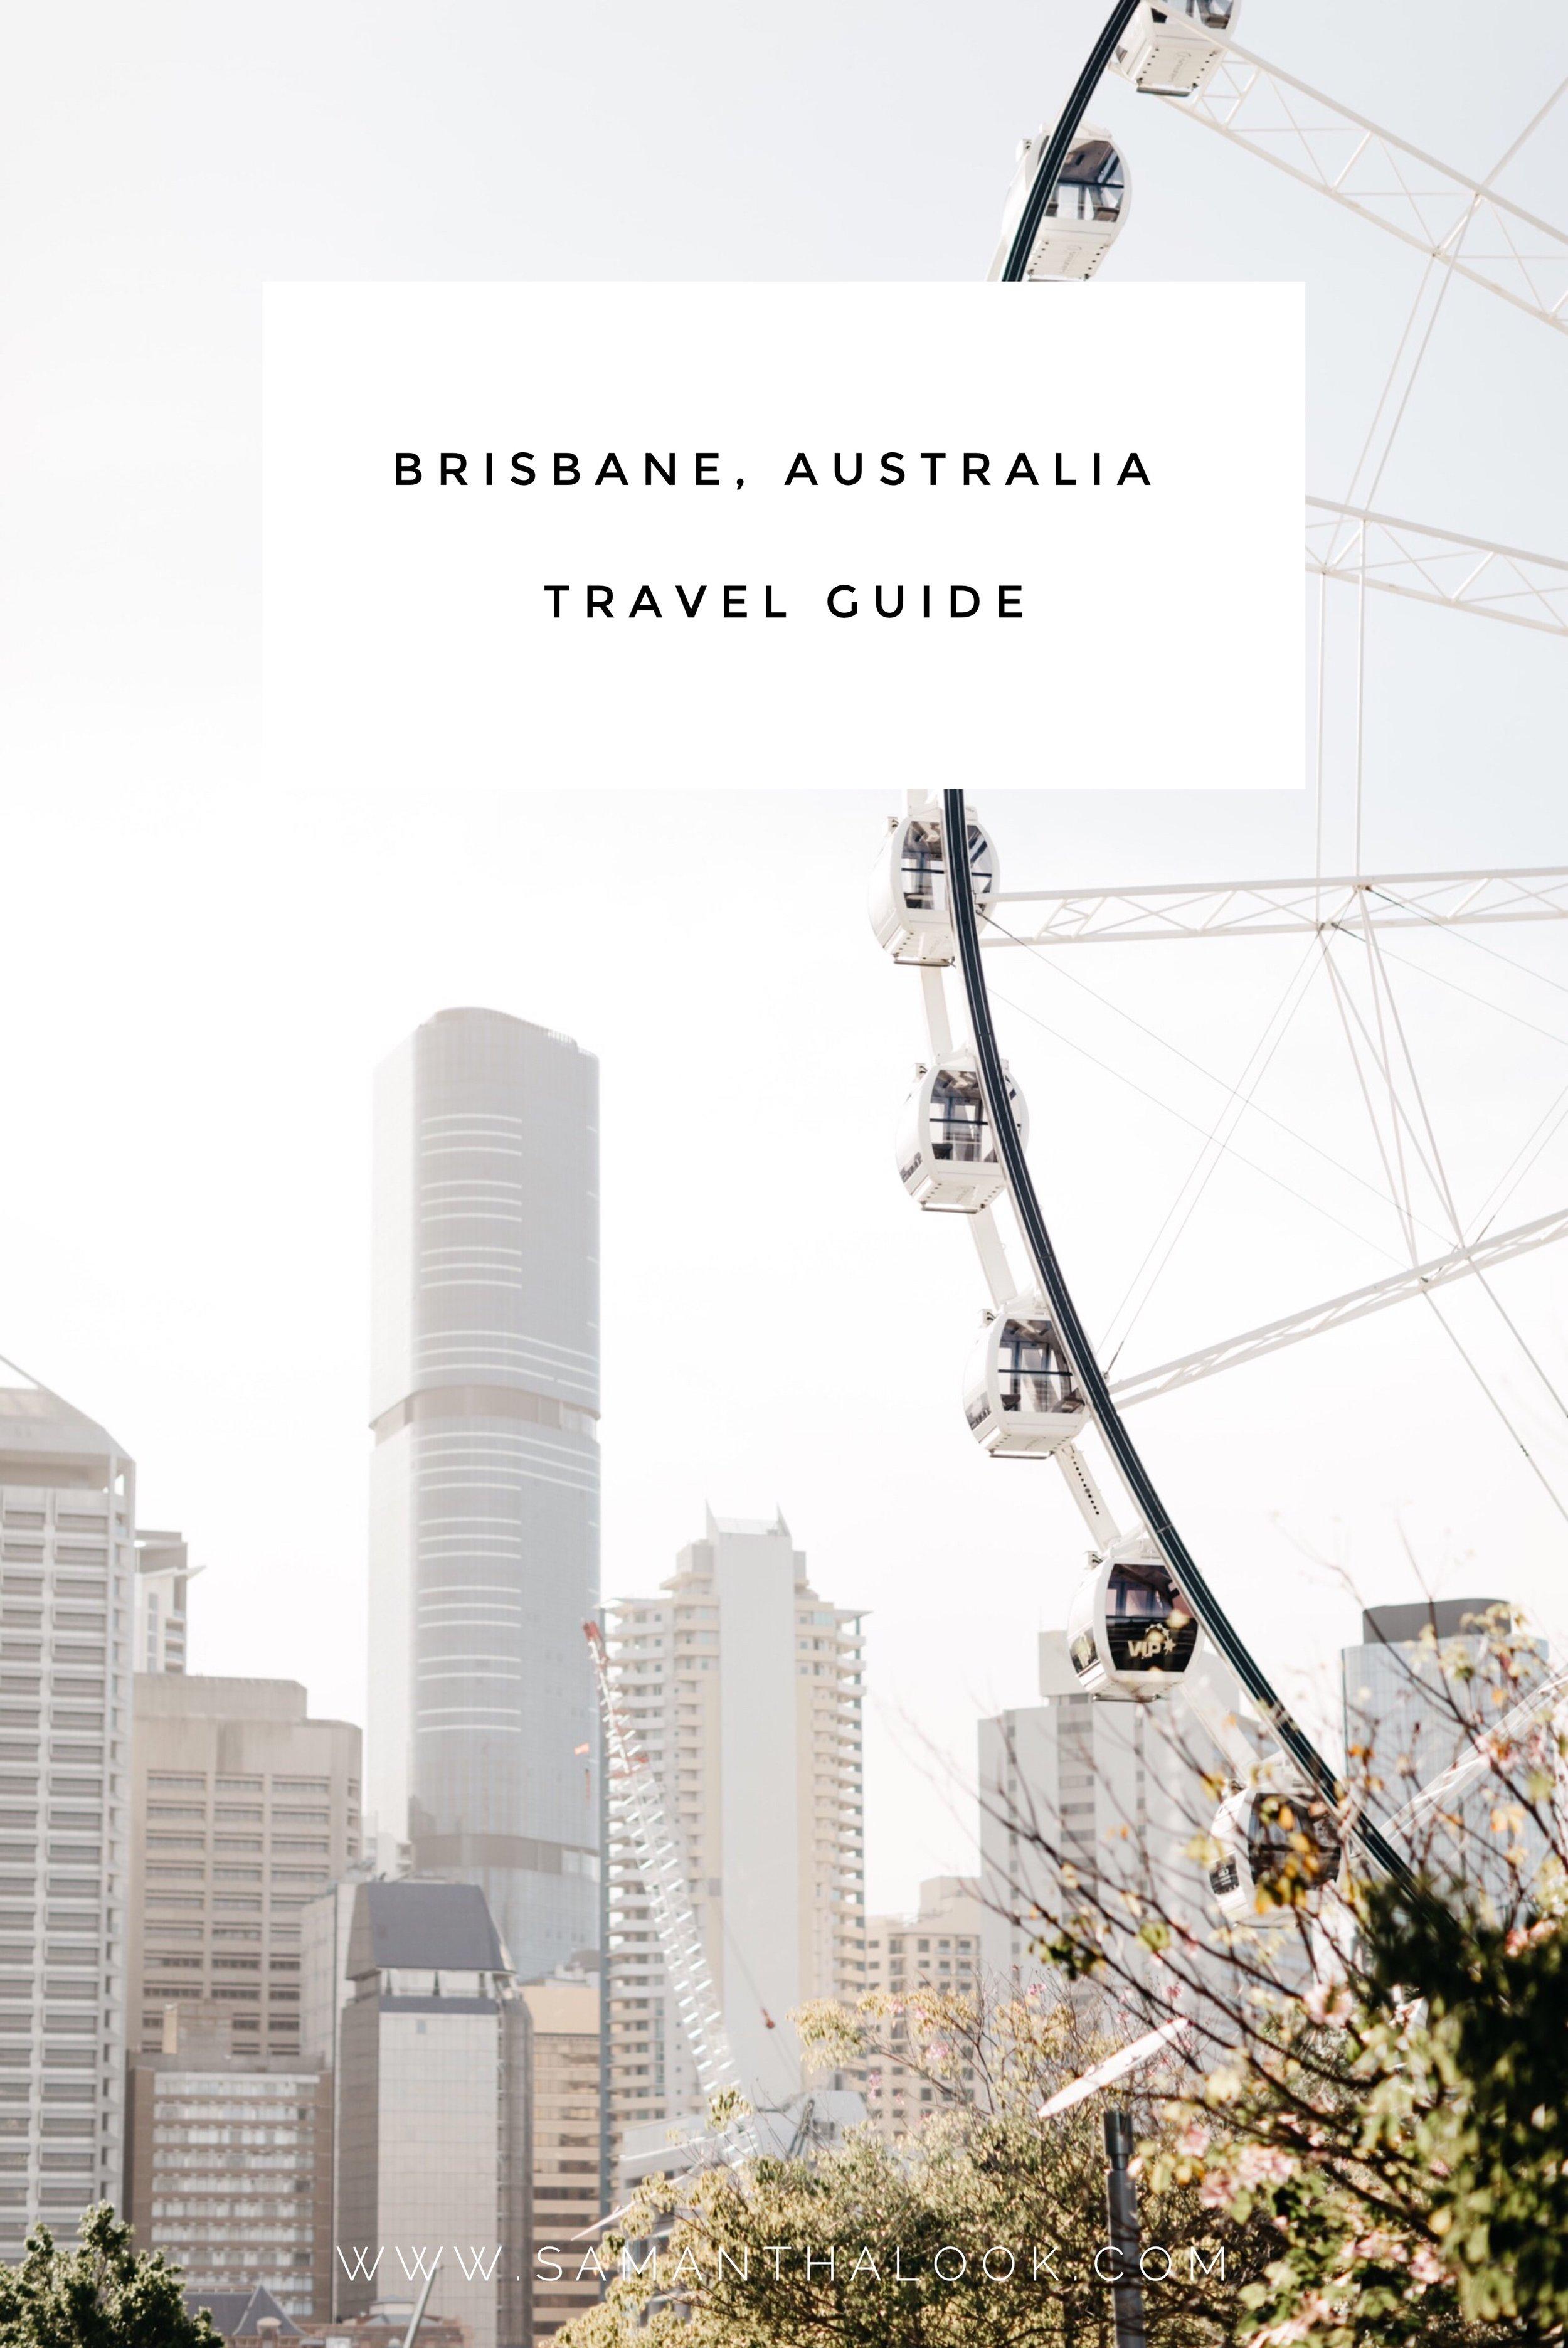 brisbane-australia-travel-guide-by-samantha-look.jpeg